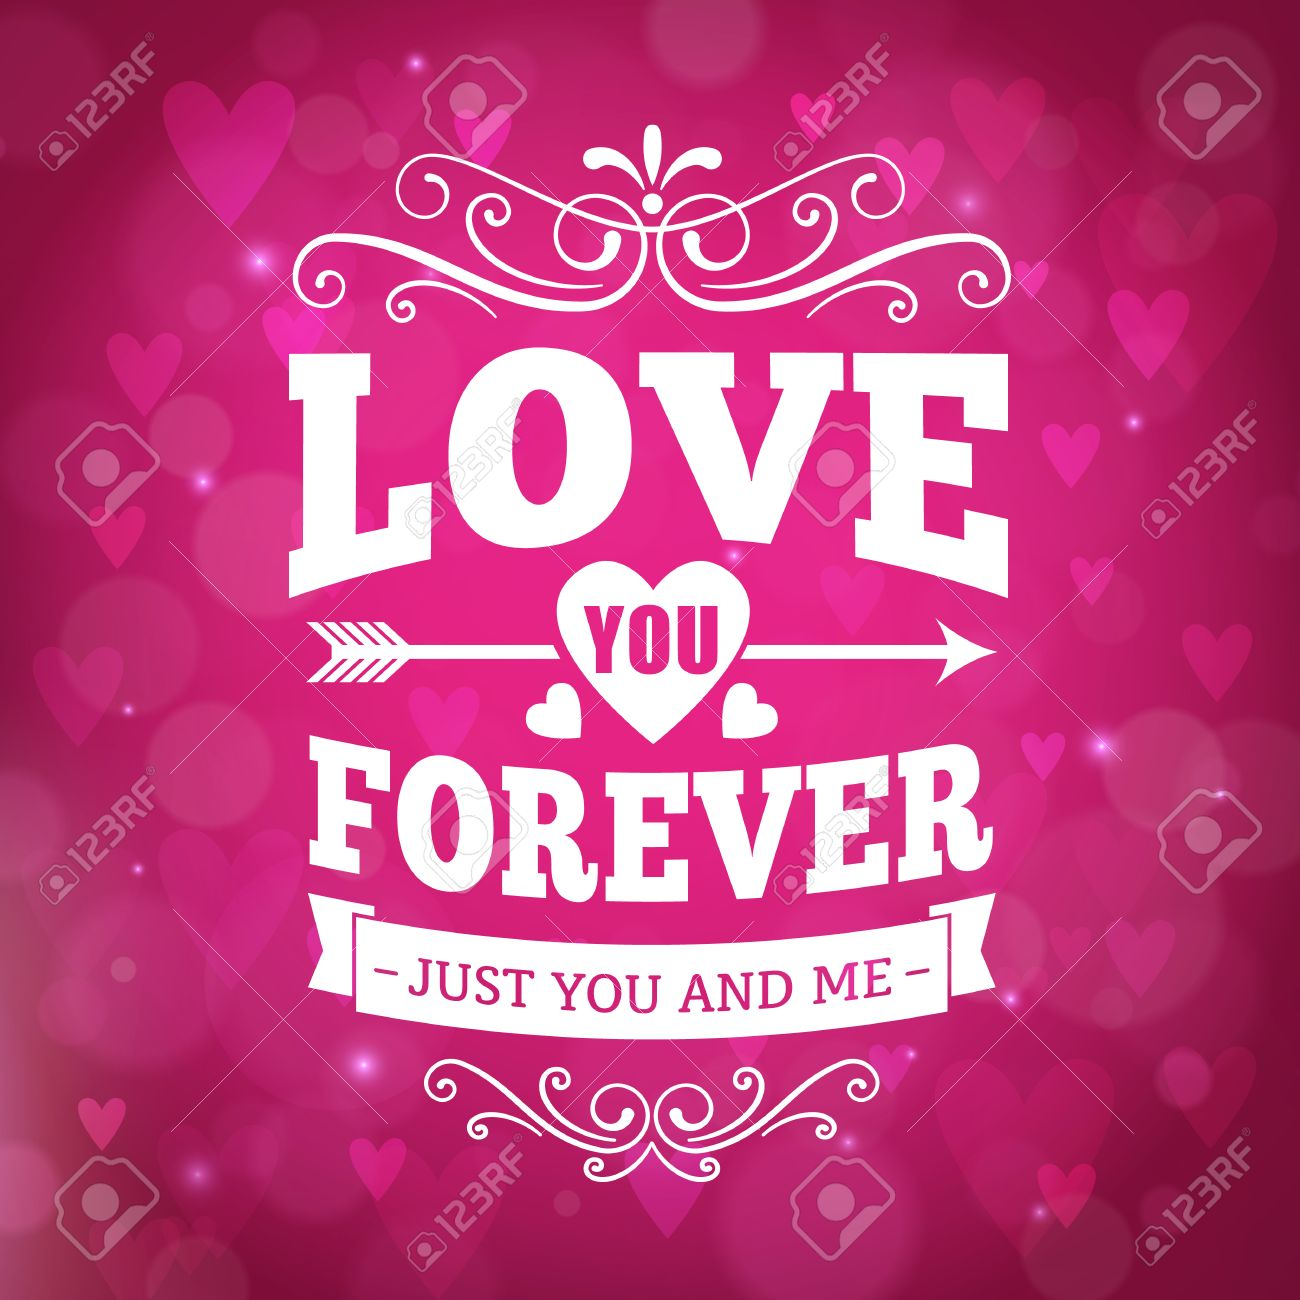 Love you forever typografie wenskaart achtergrond ontwerp royalty love you forever typografie wenskaart achtergrond ontwerp stockfoto 35389432 voltagebd Images